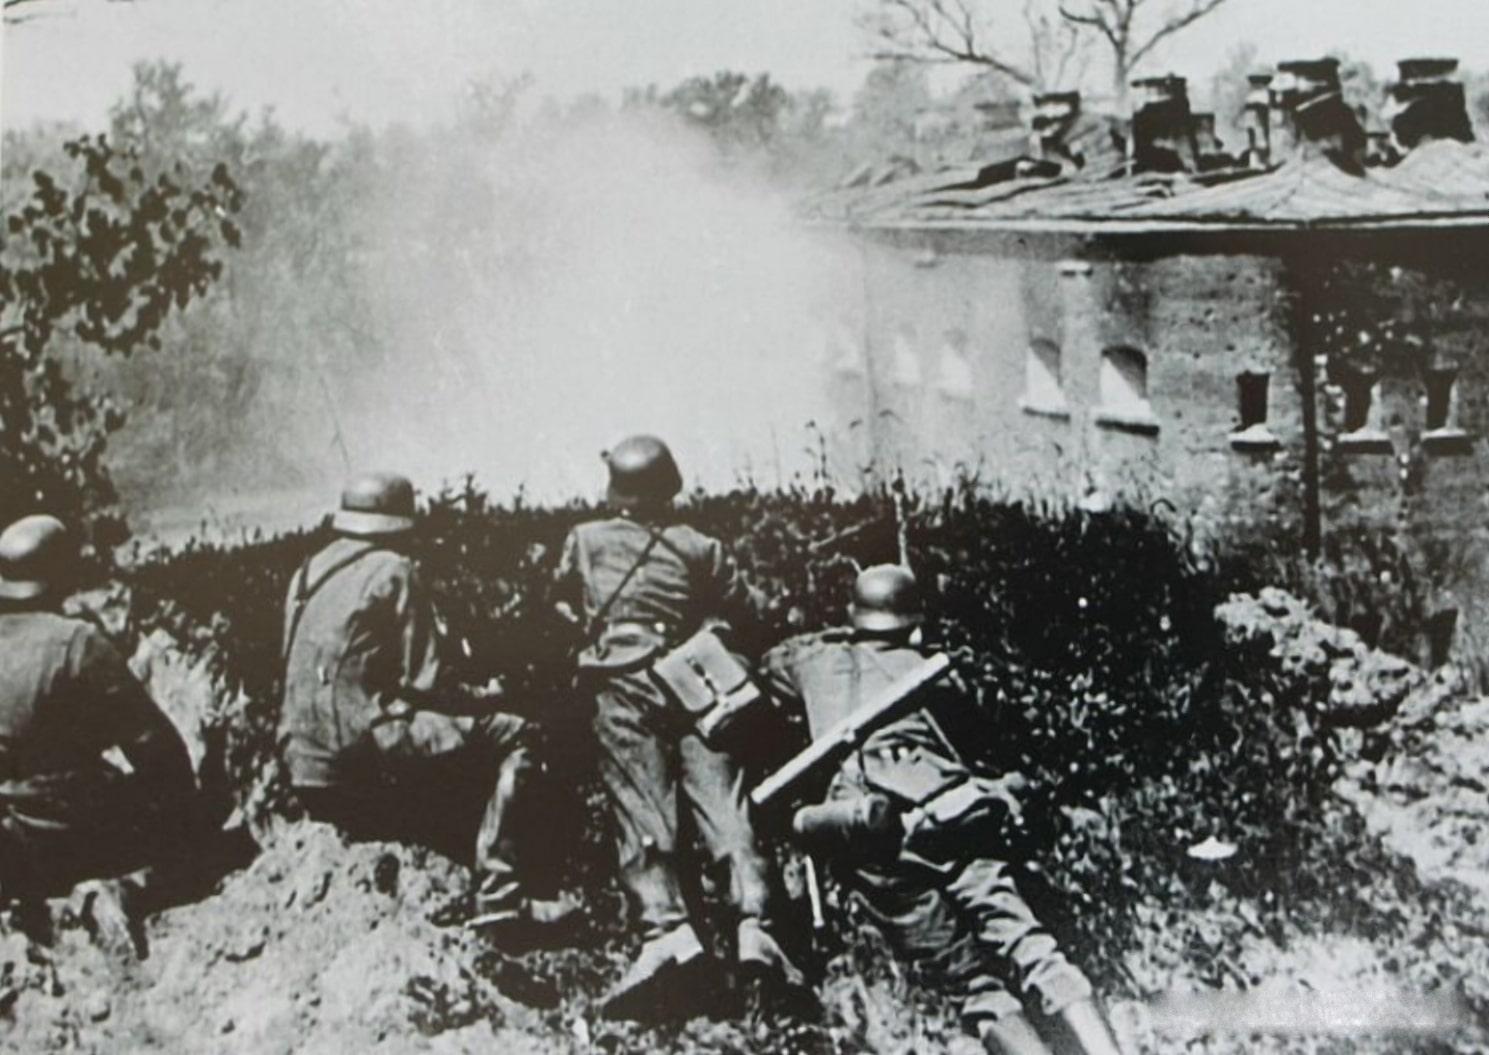 28 июня 1941 года бои в крепости шли активно